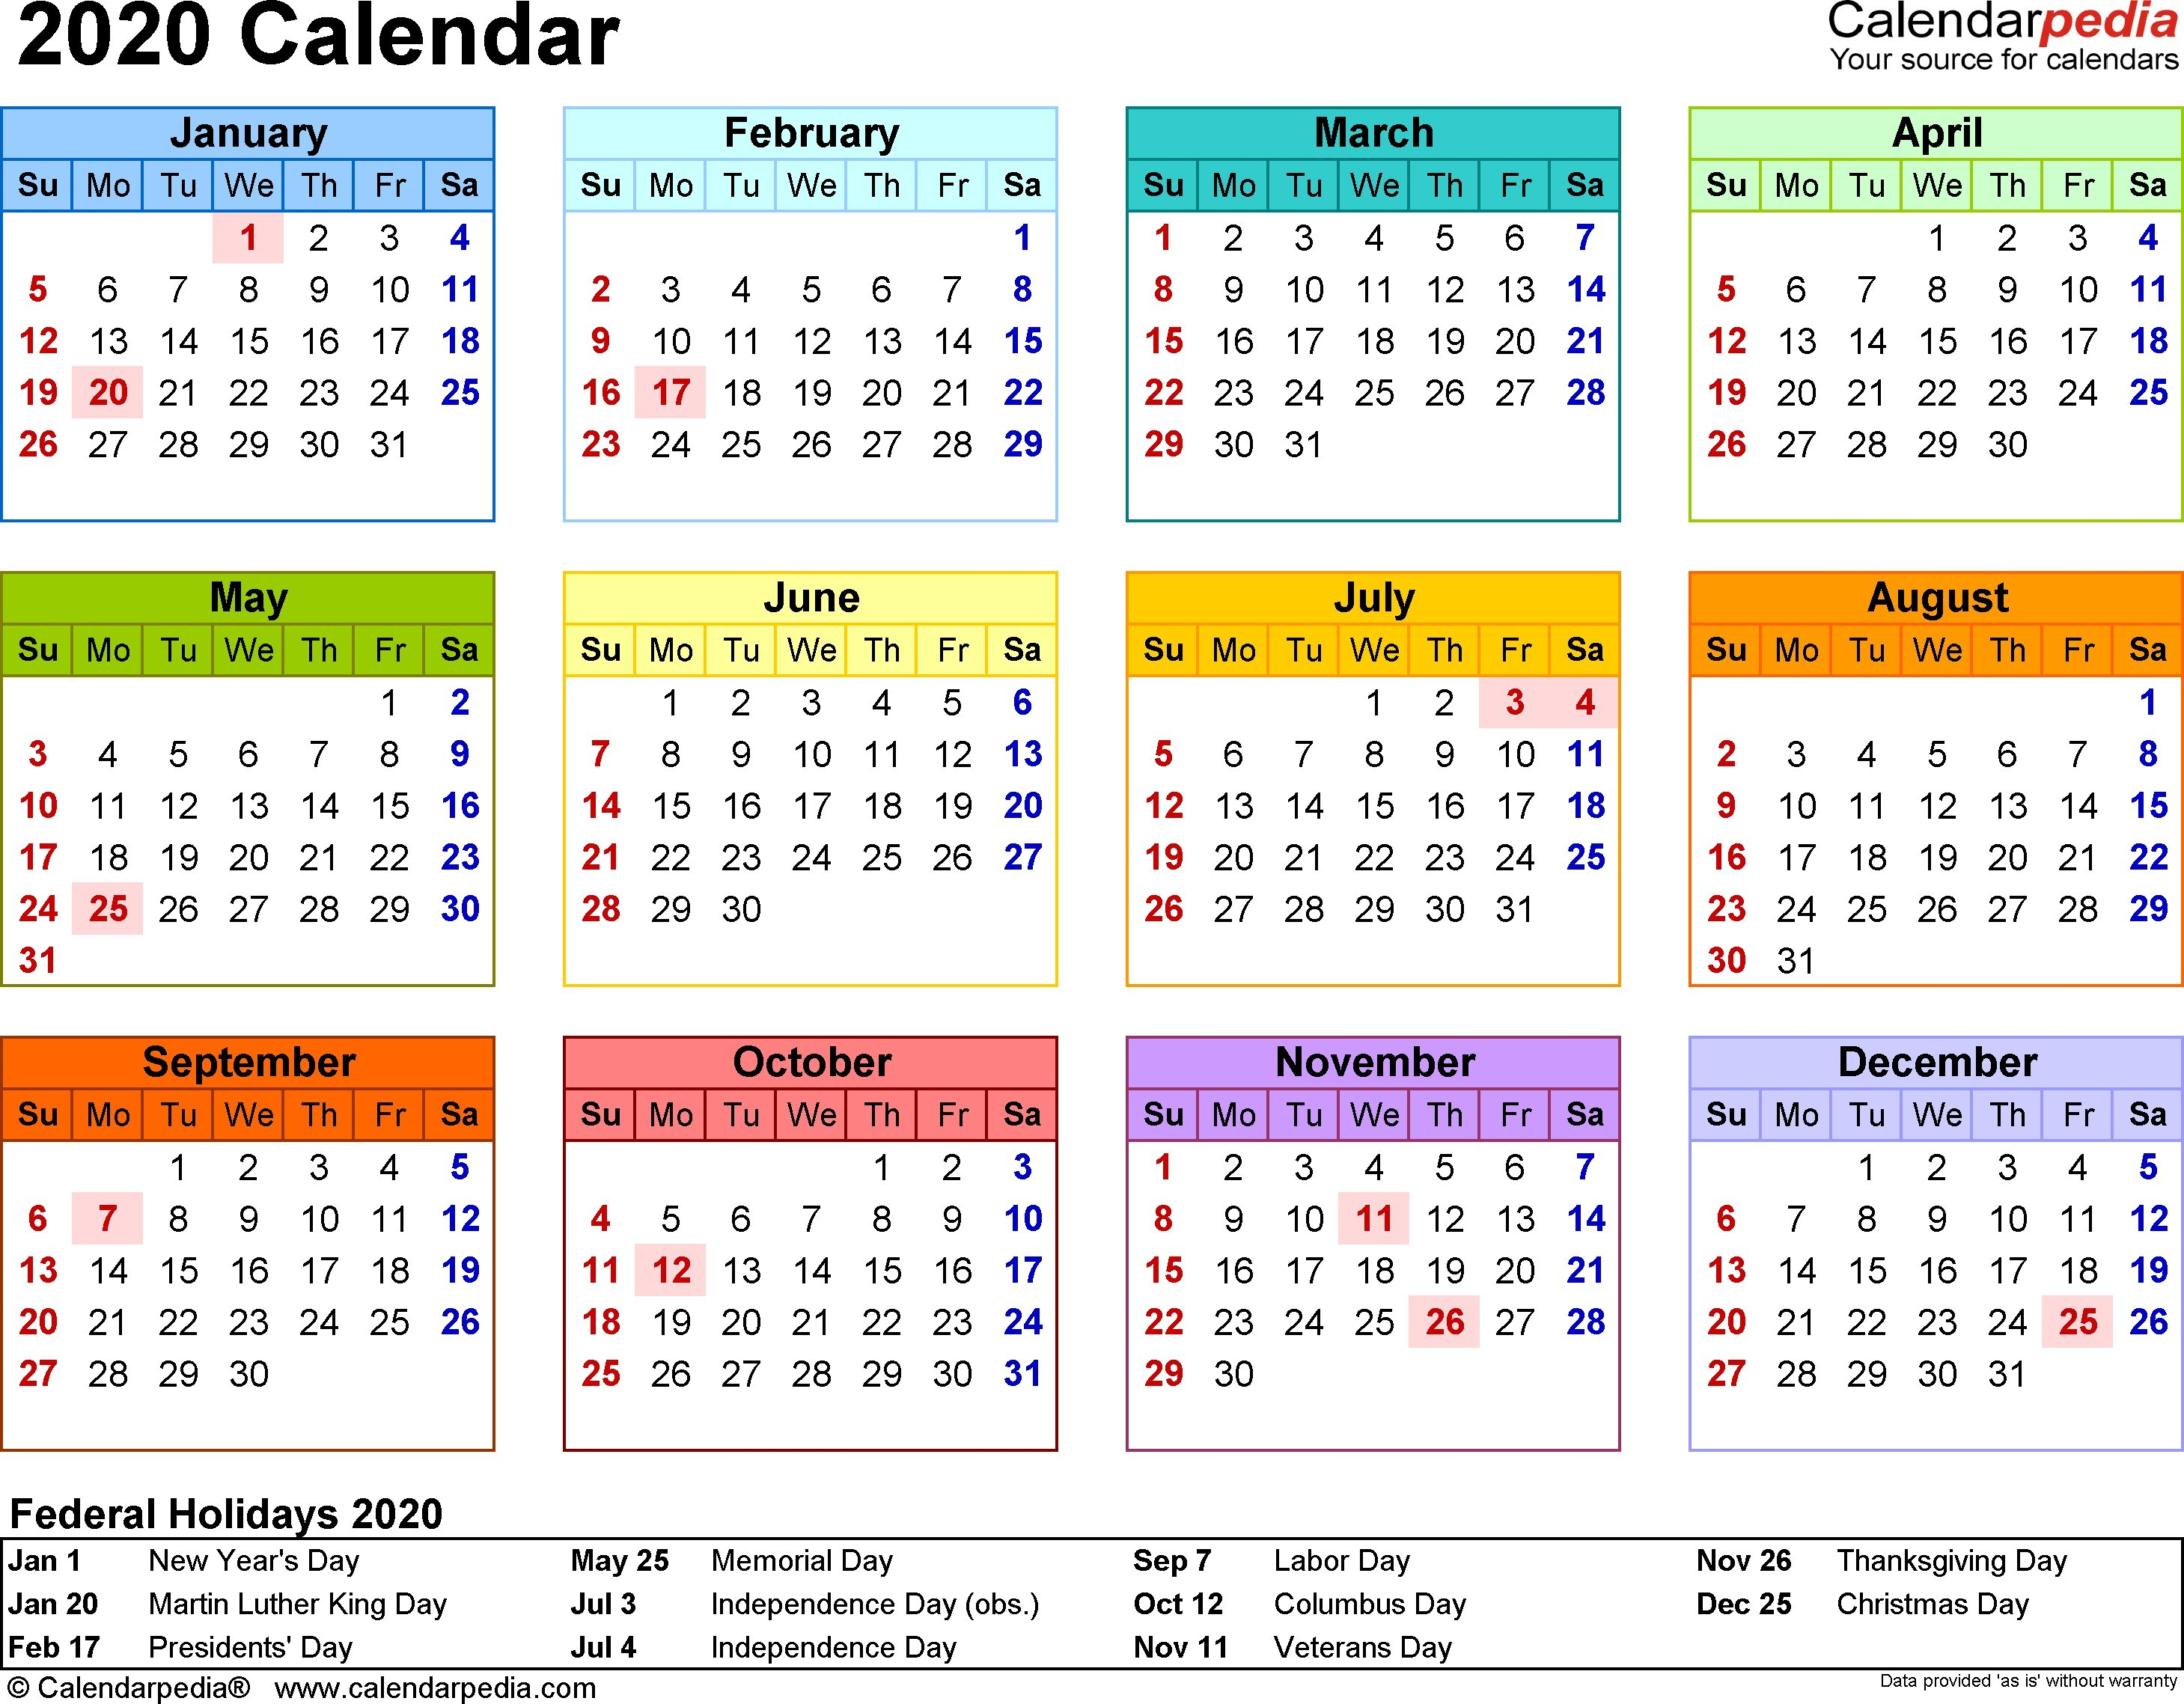 Calendars Printable 2020 Best 2020 Calendar Printable E Page Calendar 2019